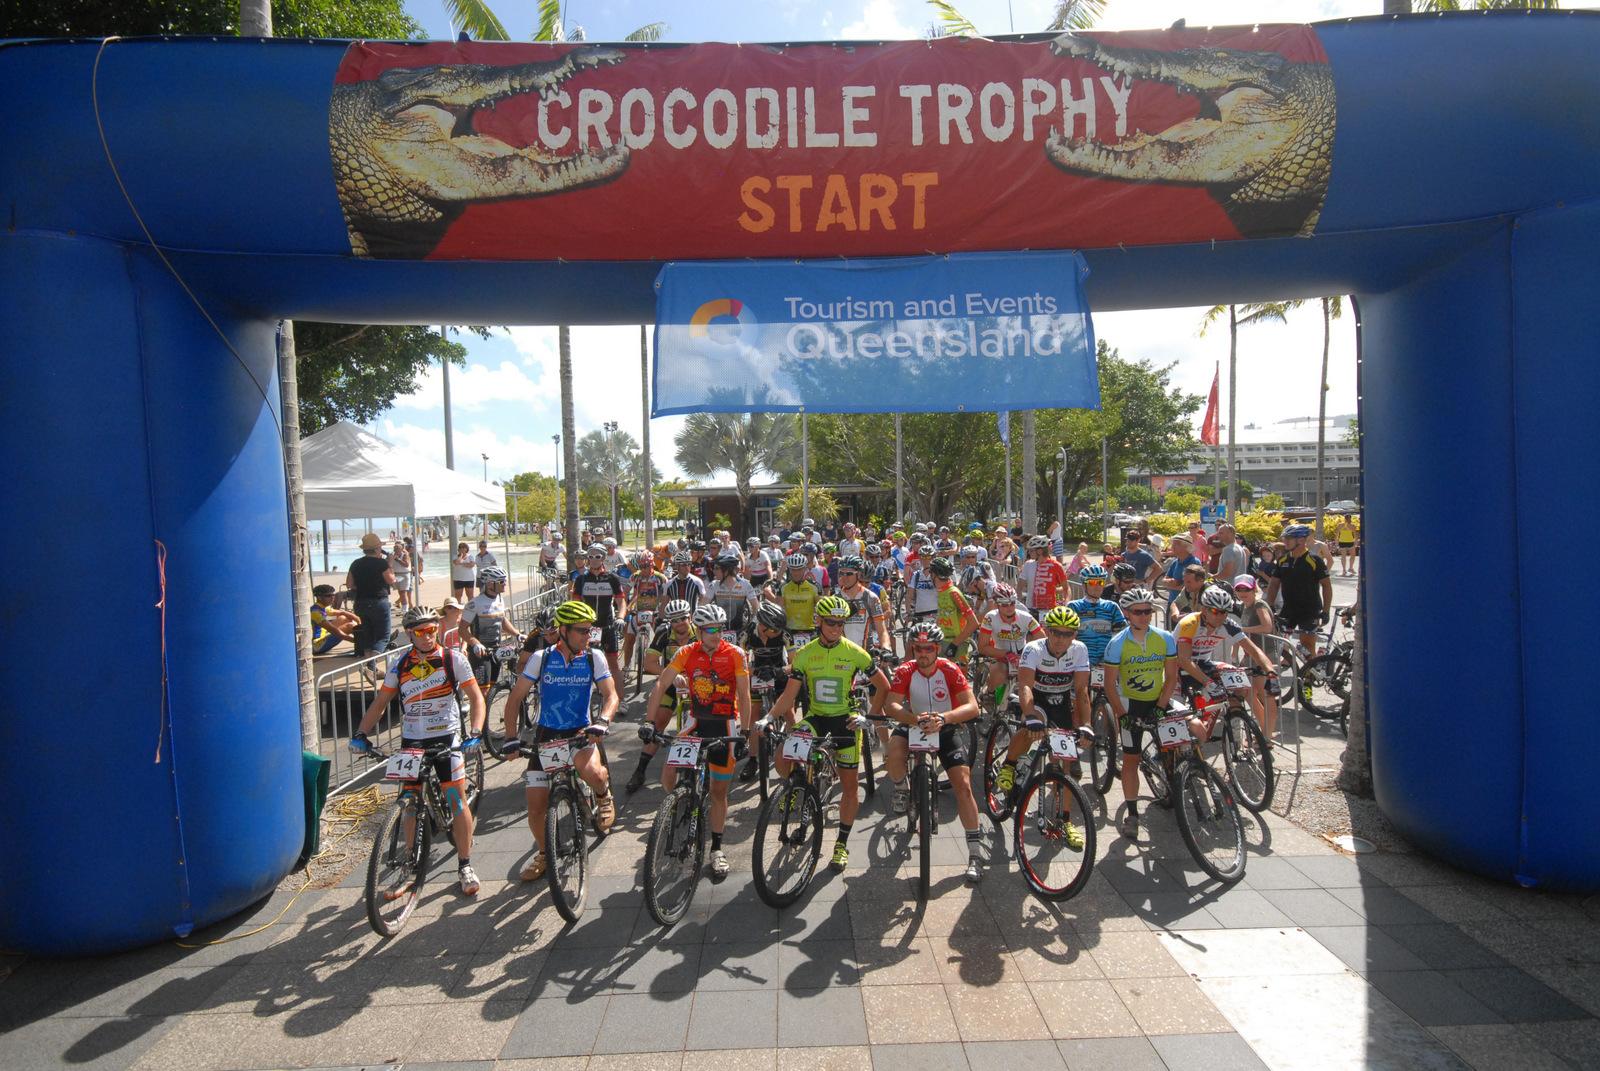 Crocodile Trophy rajt tavaly